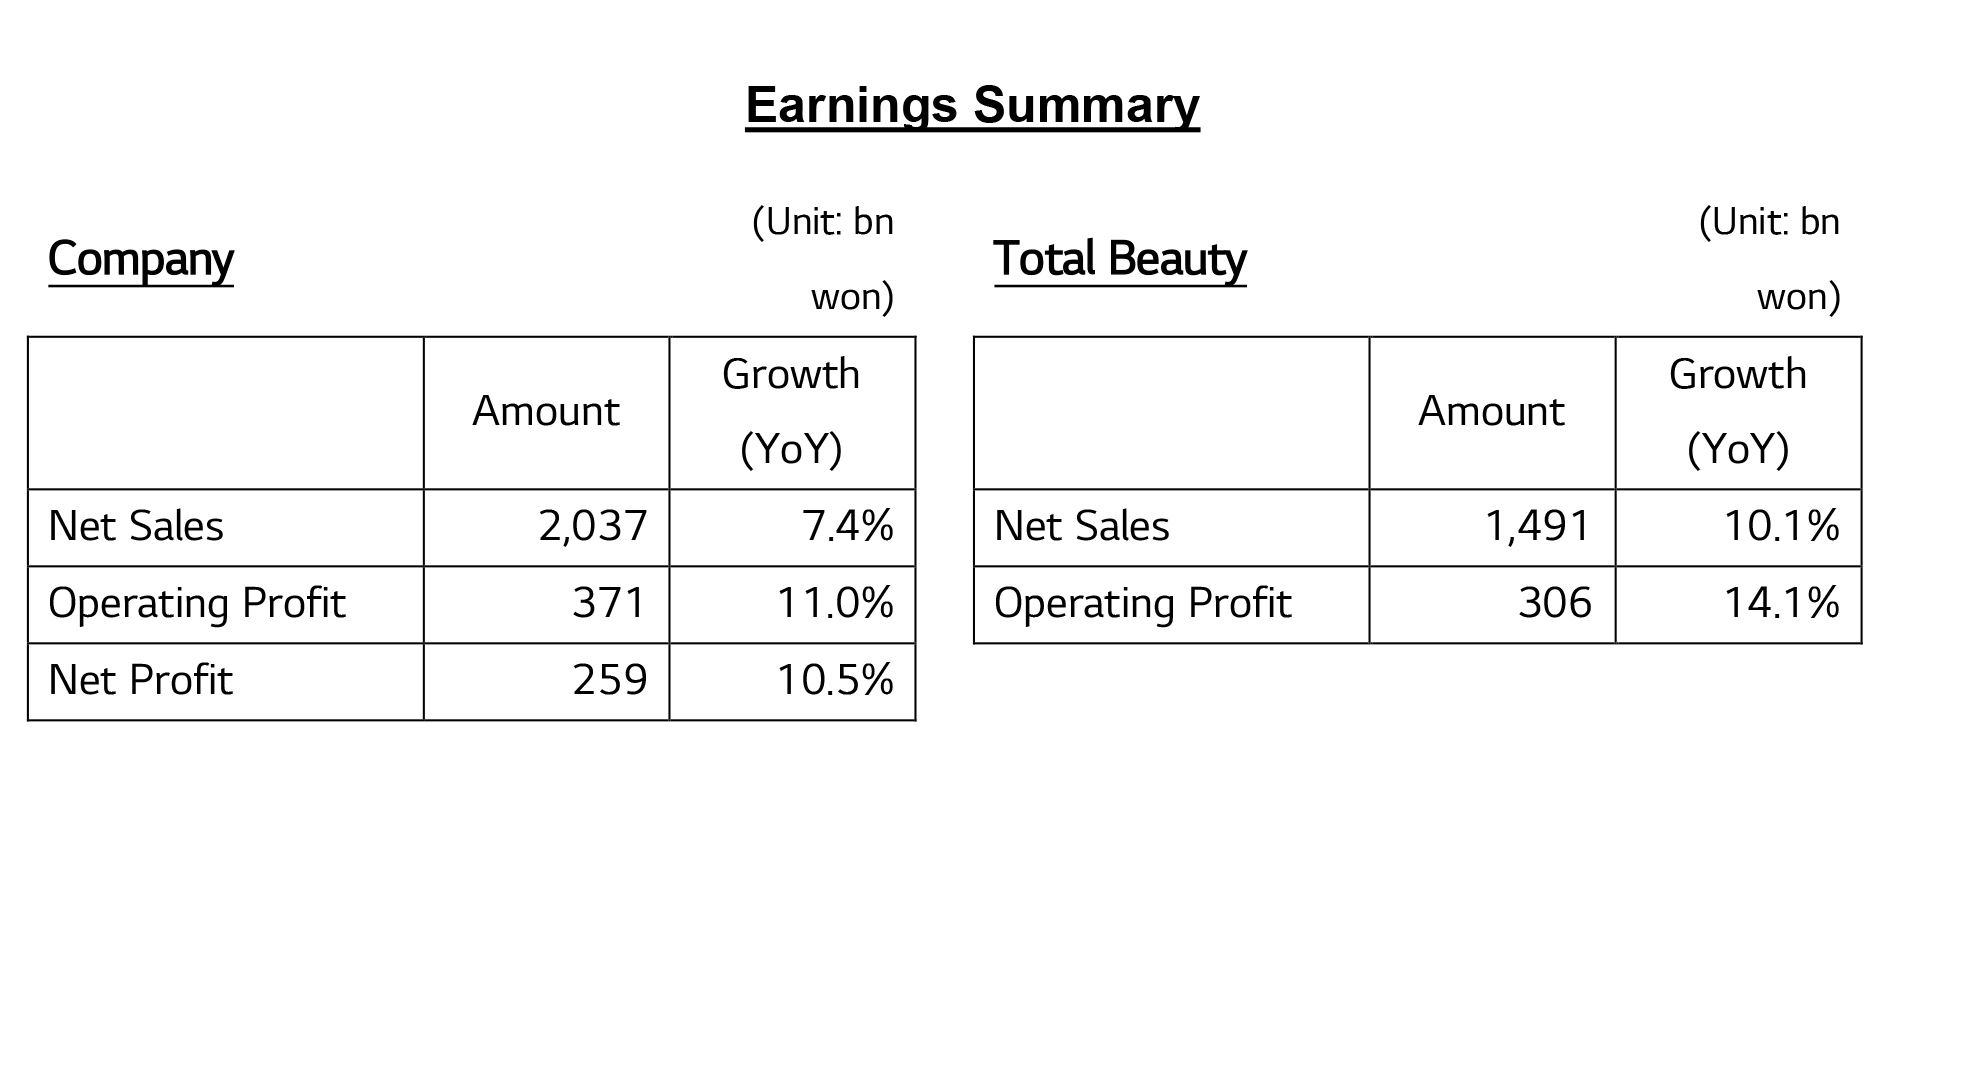 Earnings Summary